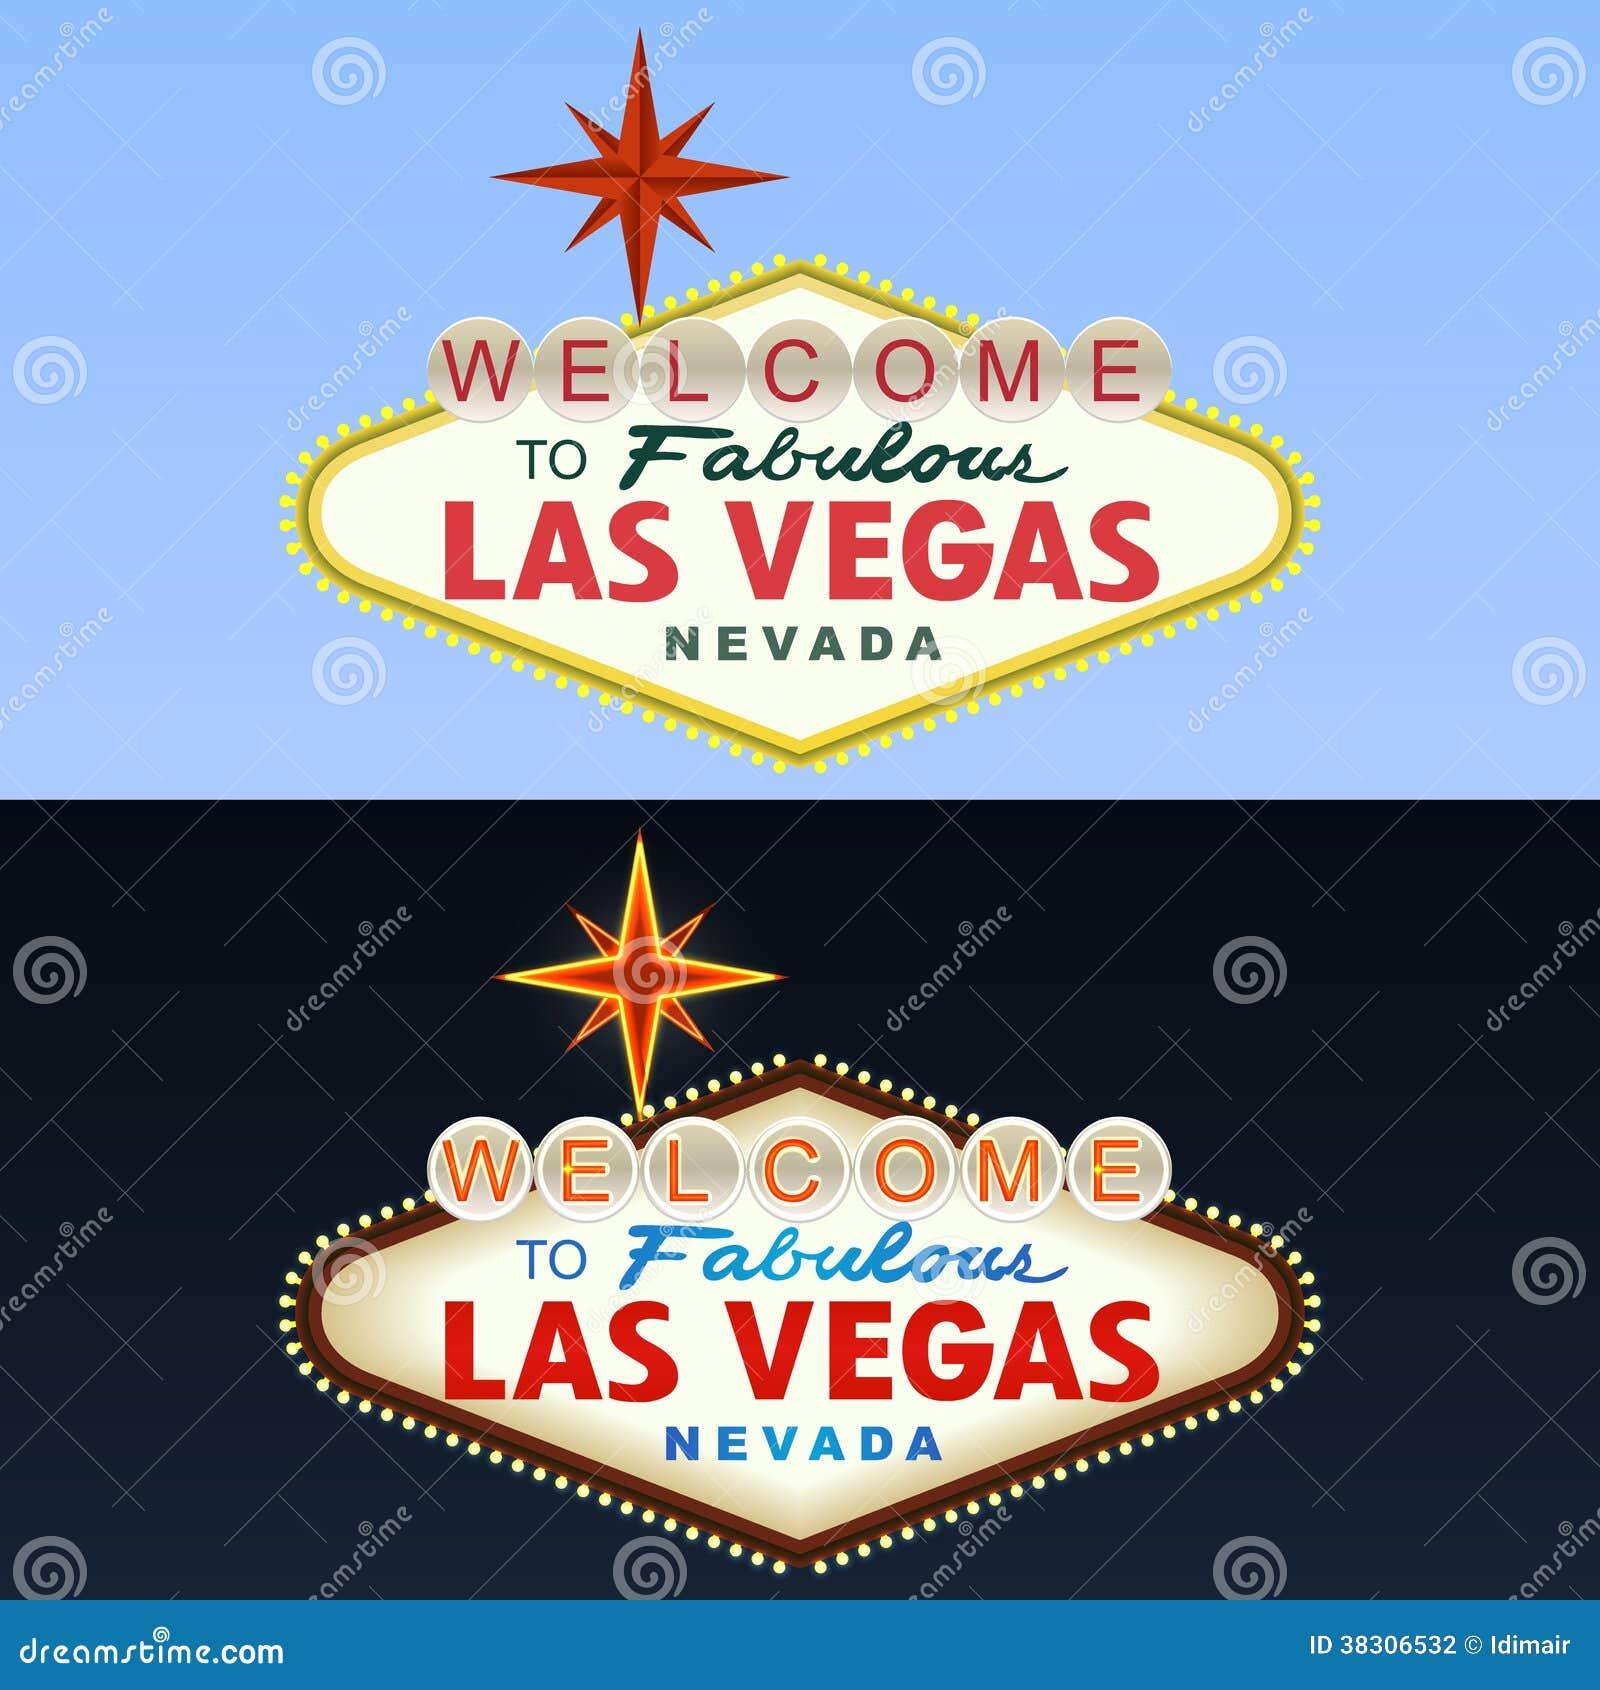 Cityclub casino 3